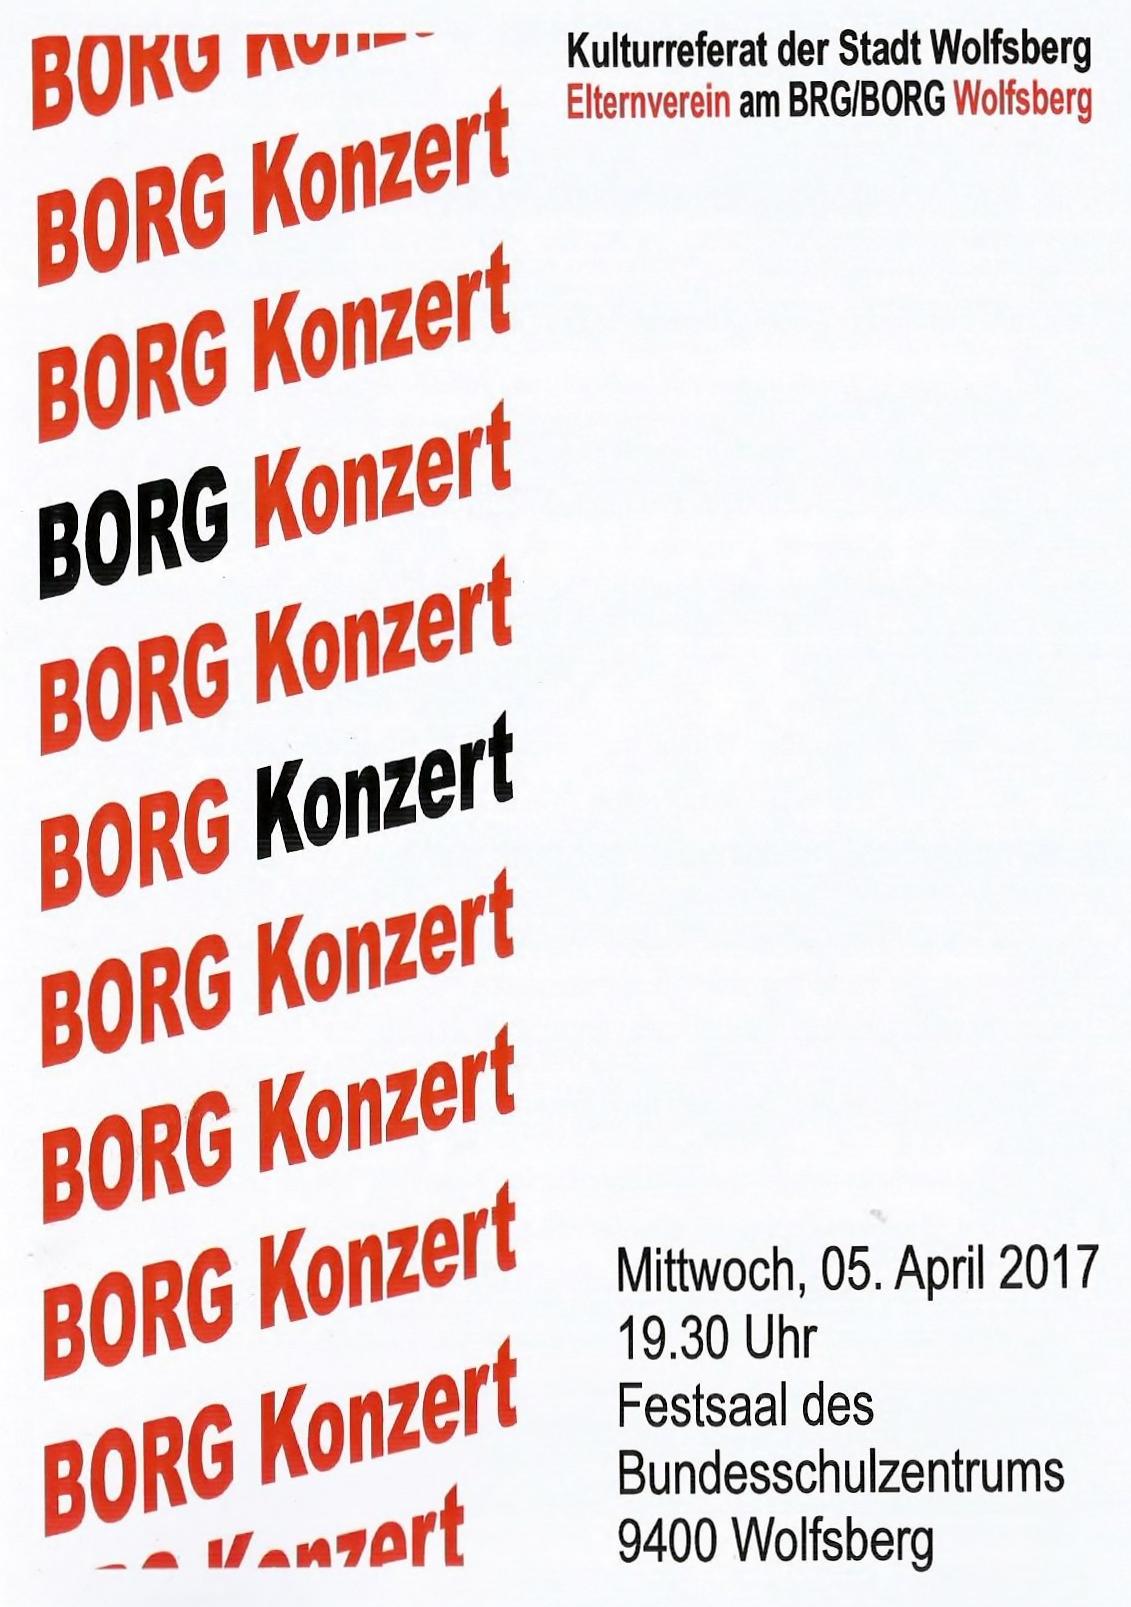 BORGKonzert (1131x1607)